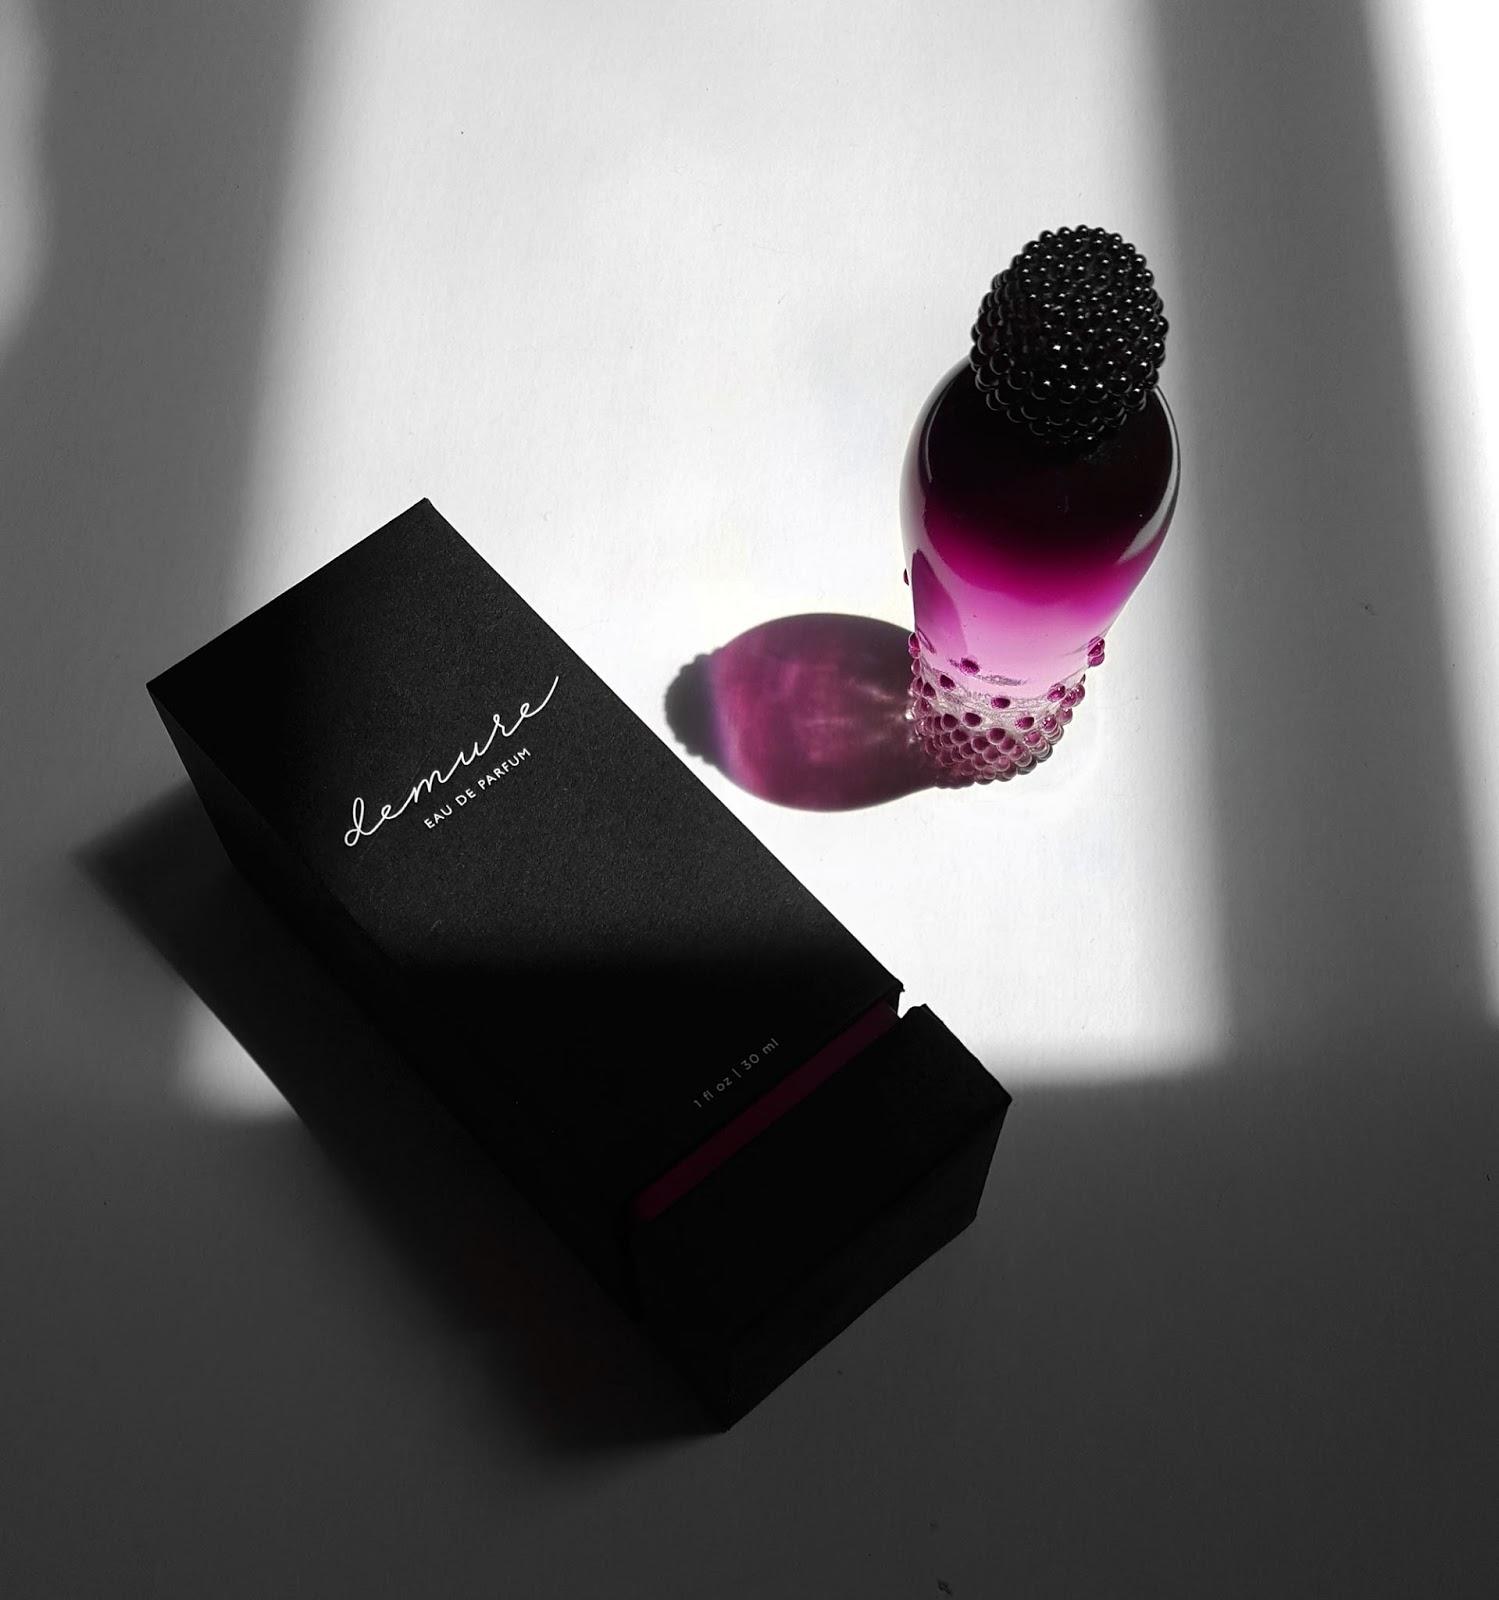 Eau De Perfume Meaning